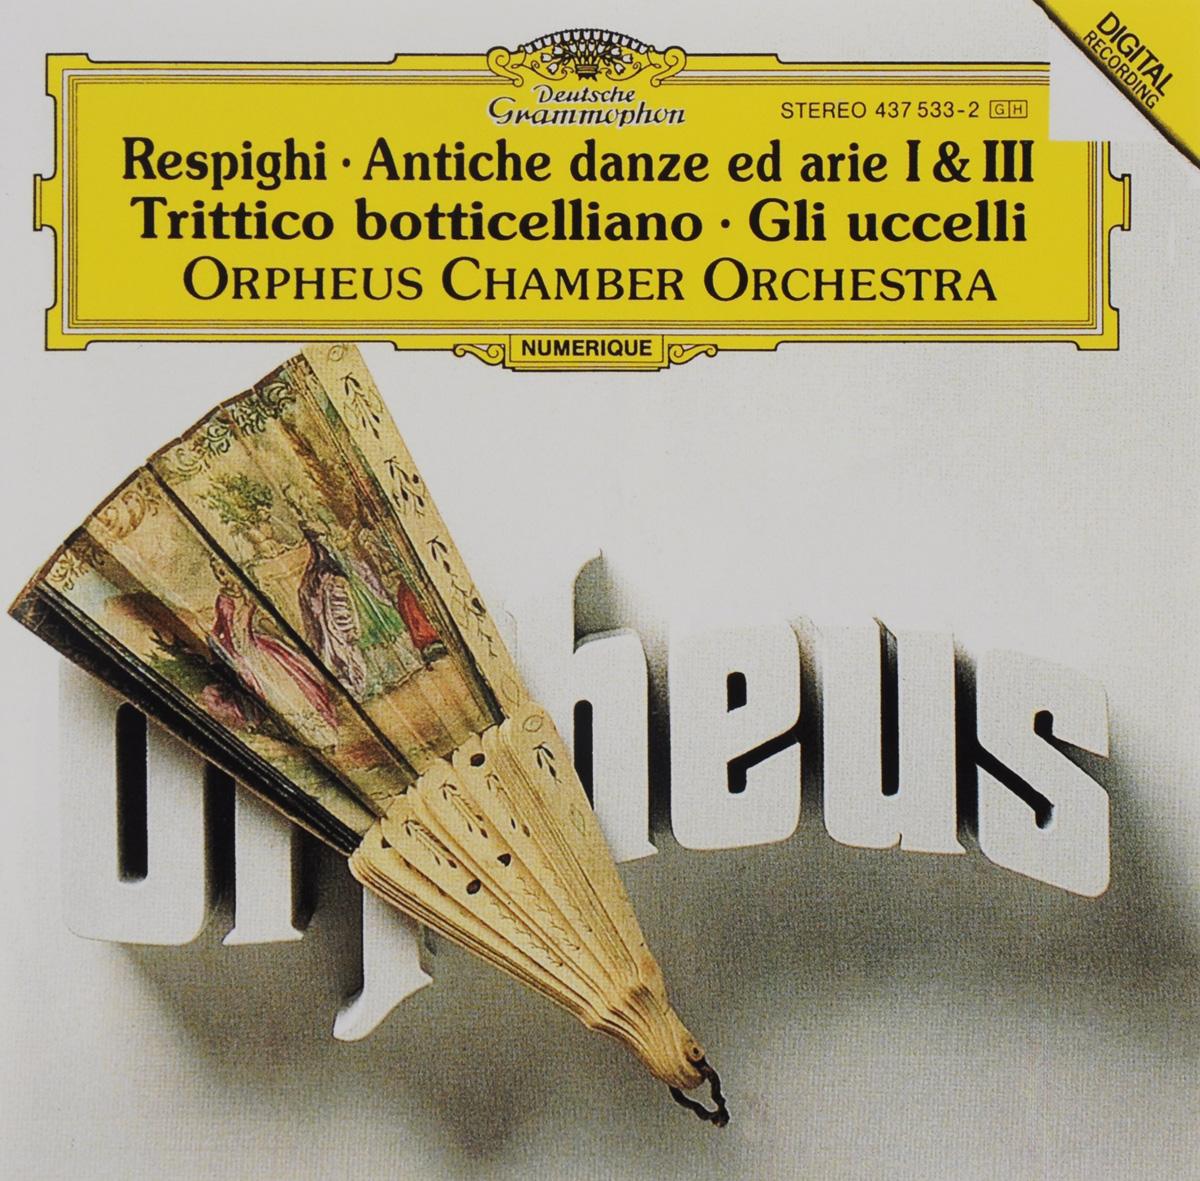 цена Orpheus Chamber Orchestra Orpheus Chamber Orchestra. Ottorino Respighi. Antiche Danze Ed Arie I & III / Trittico Botticelliano / Gli Uccelli онлайн в 2017 году